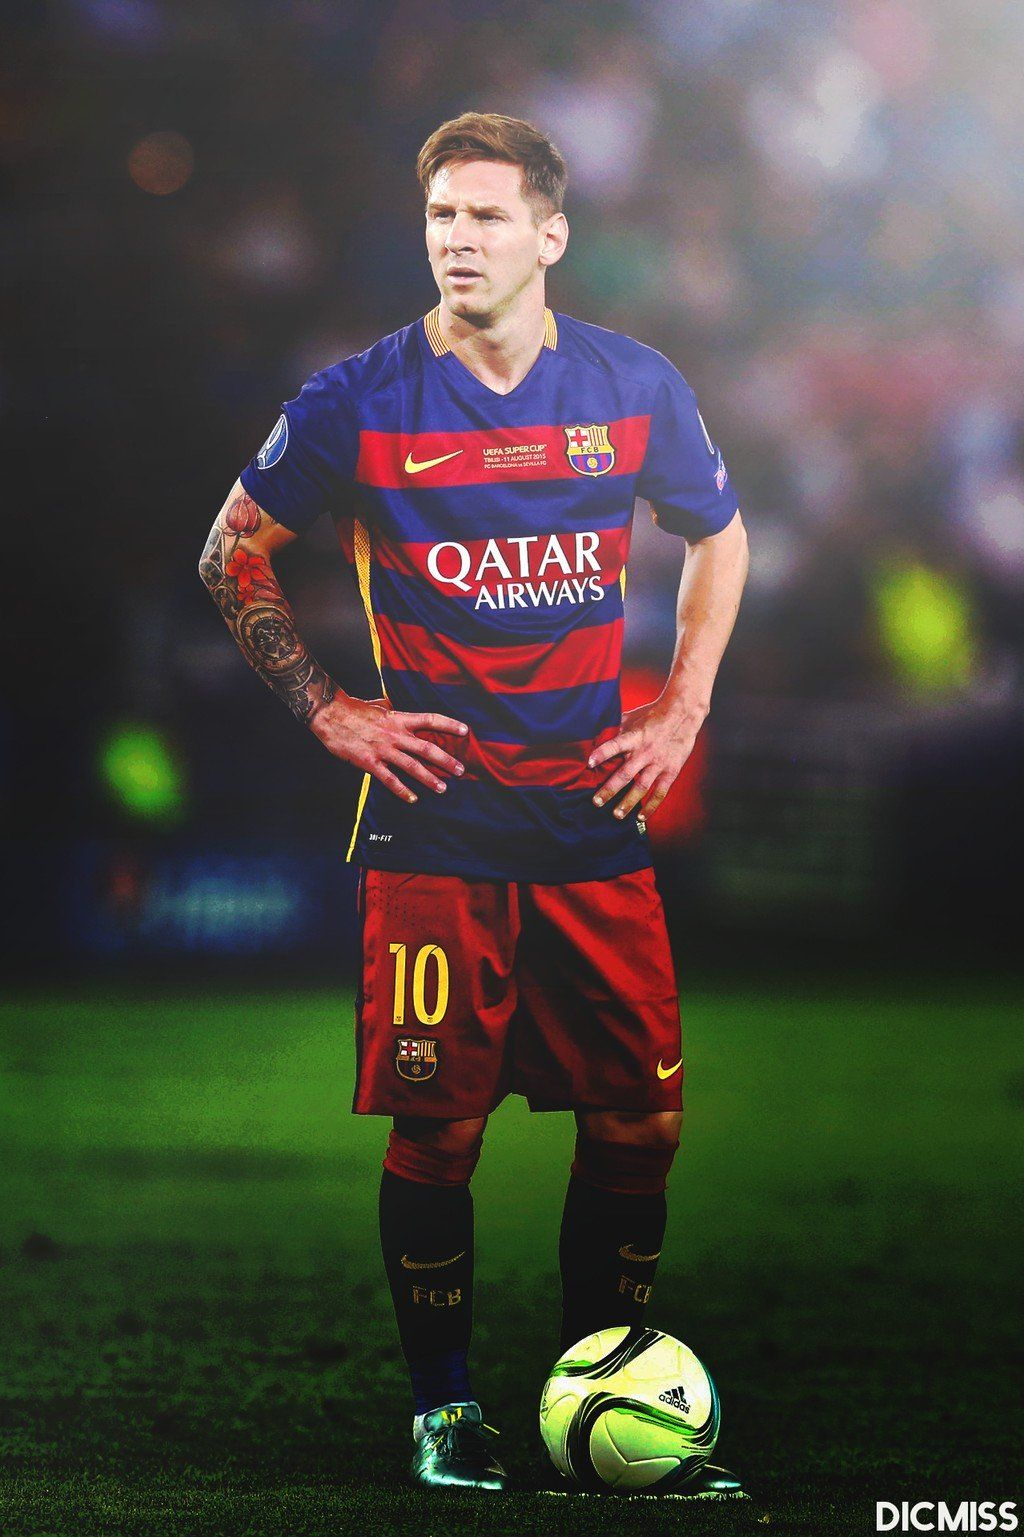 Lionel Messi 2015 Wallpapers Desktop Background Desktop Wallpaper Box Messi Messi 2015 Lionel Messi